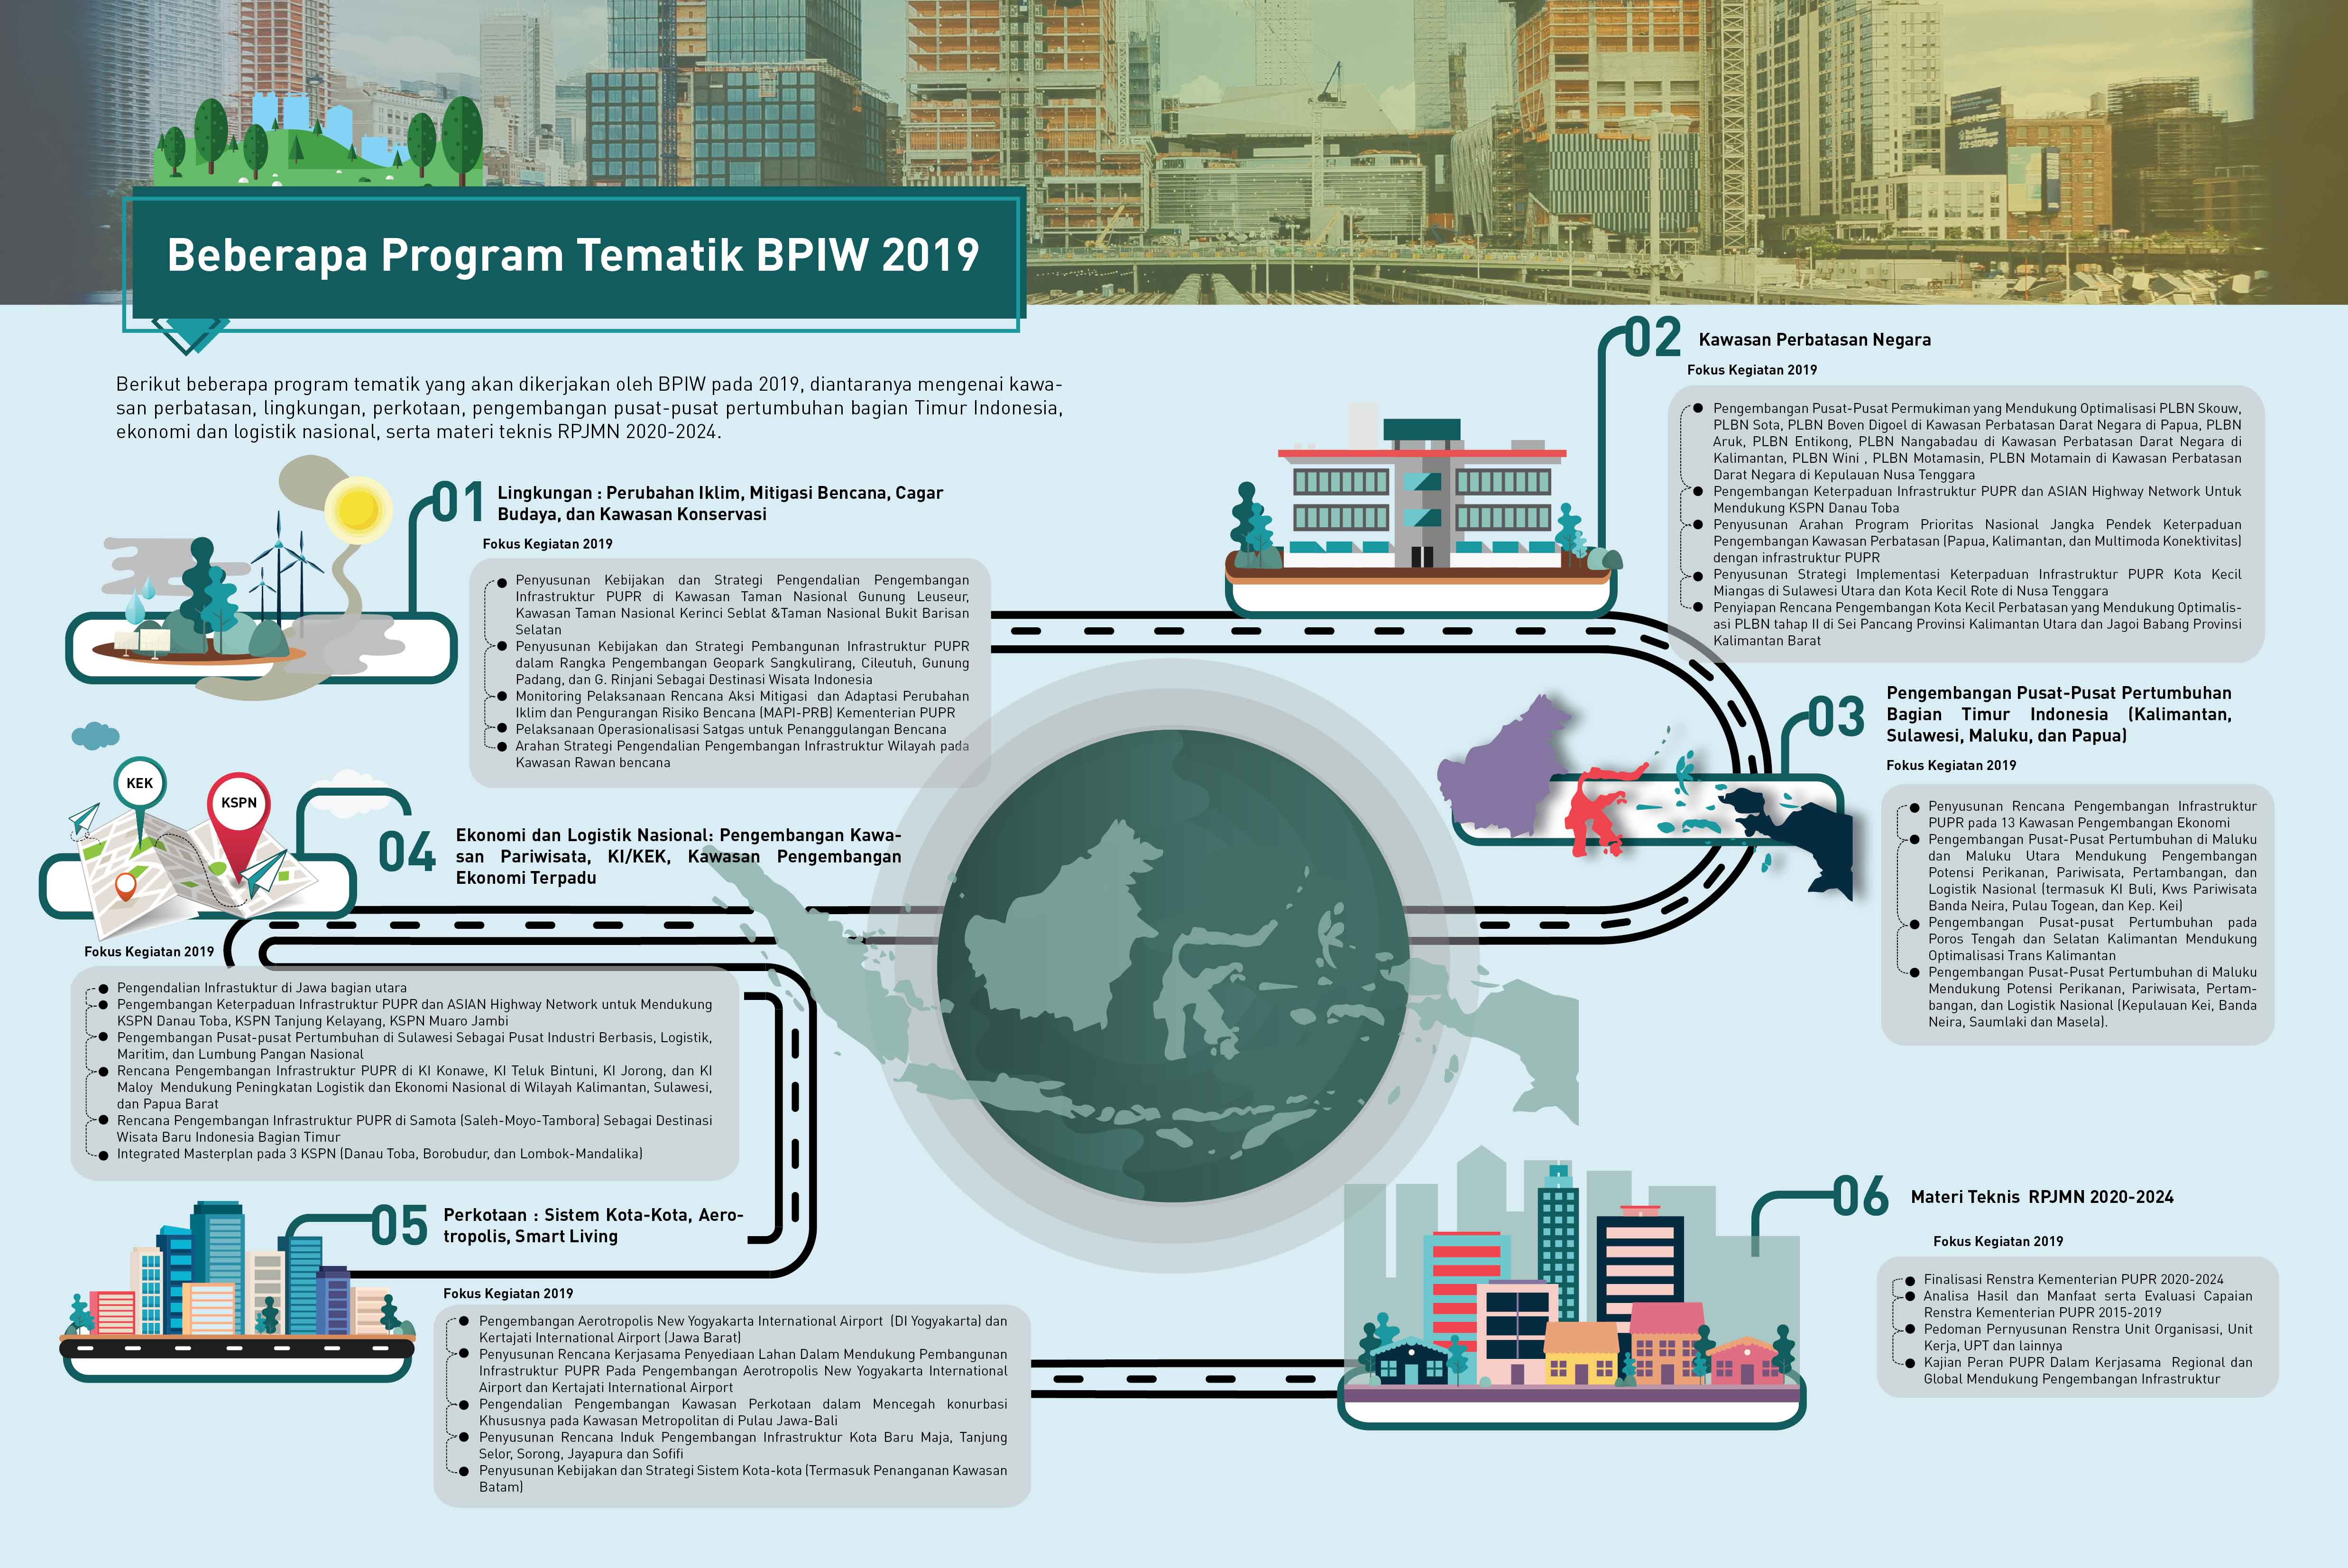 Beberapa Program Tematik BPIW 2019